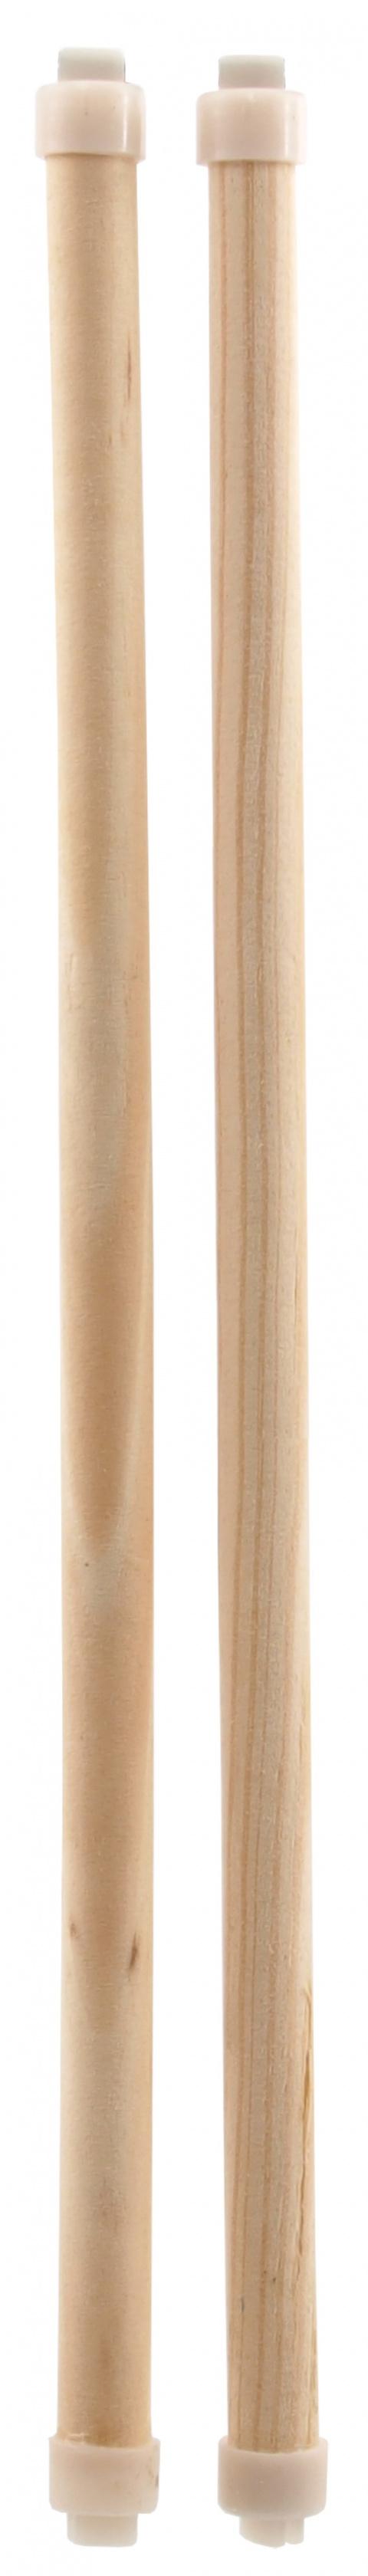 Деревянные жердочки для птиц - BIRD JEWEL 40,6 cm (2 шт)